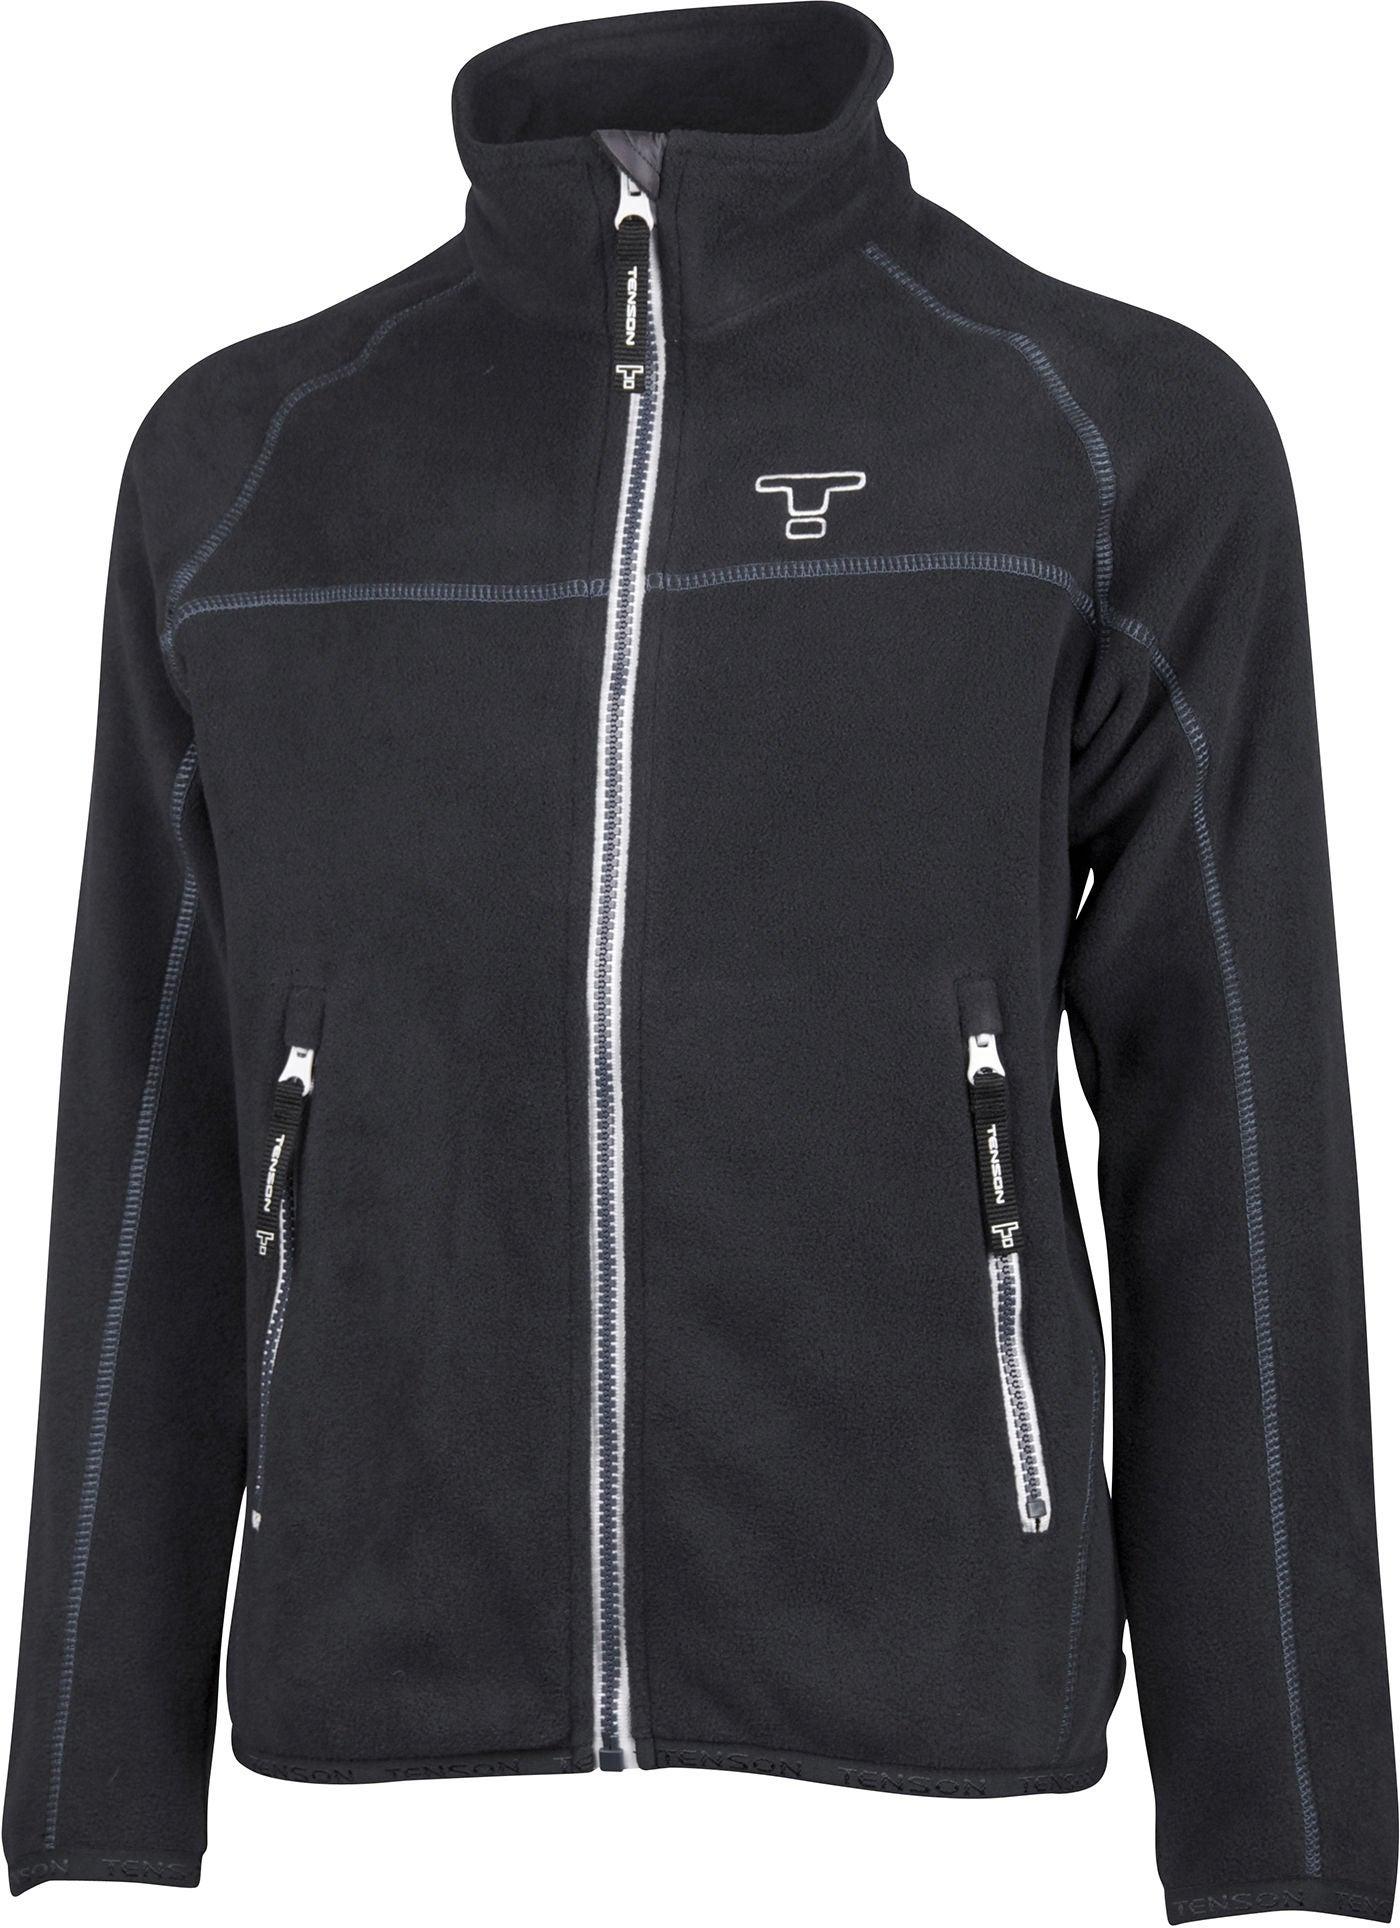 Tenson Moment Fleece, Black 122-128